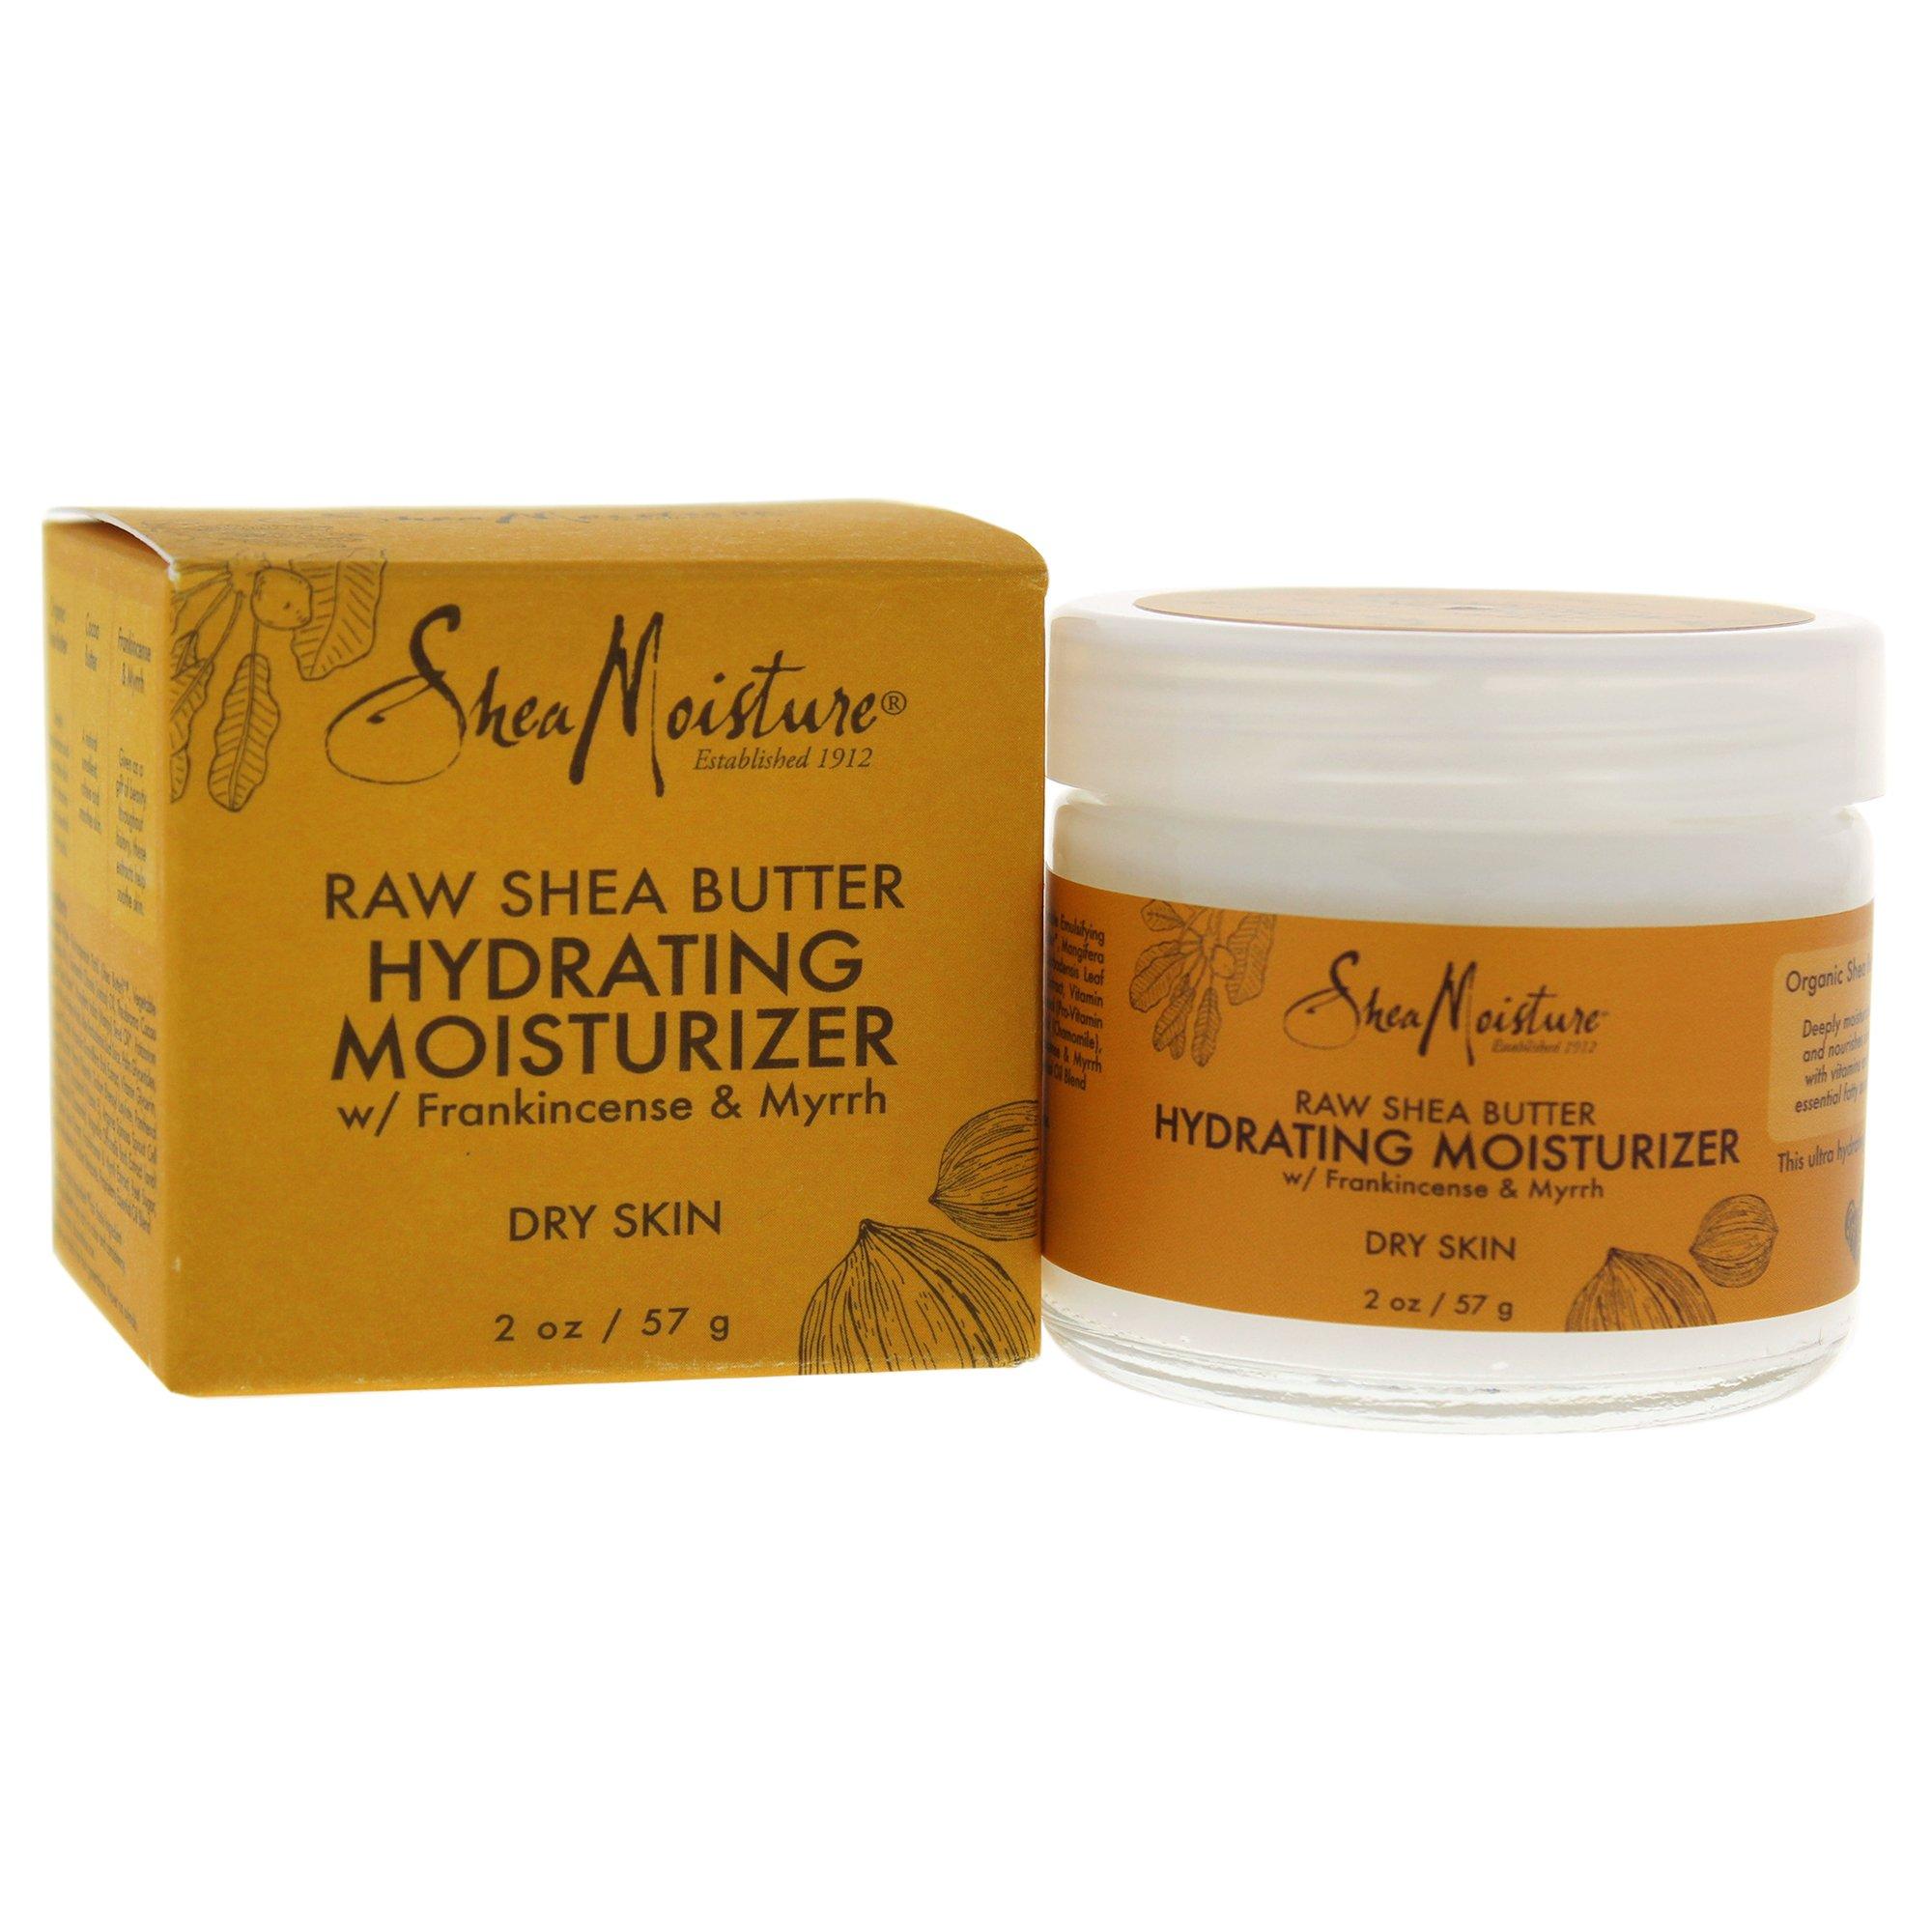 SheaMoisture Raw Shea Butter Hydrating Moisturizer, 2 Ounce